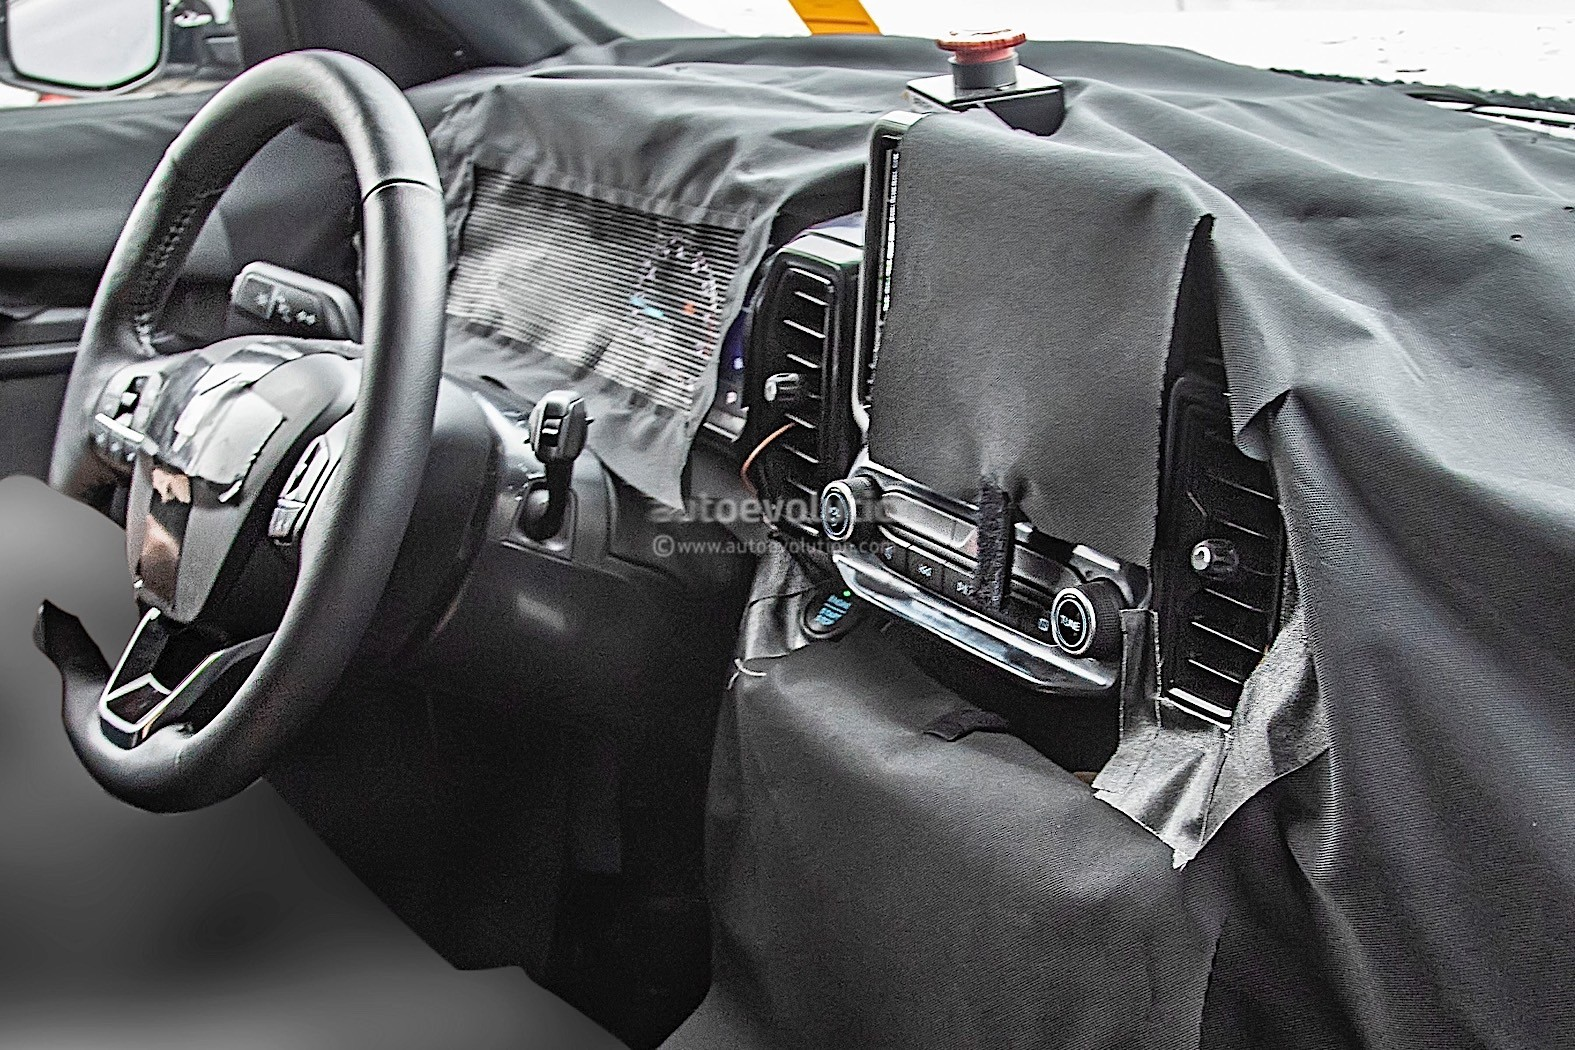 2021 Ford Bronco Sport Engine Options Revealed, Three ...